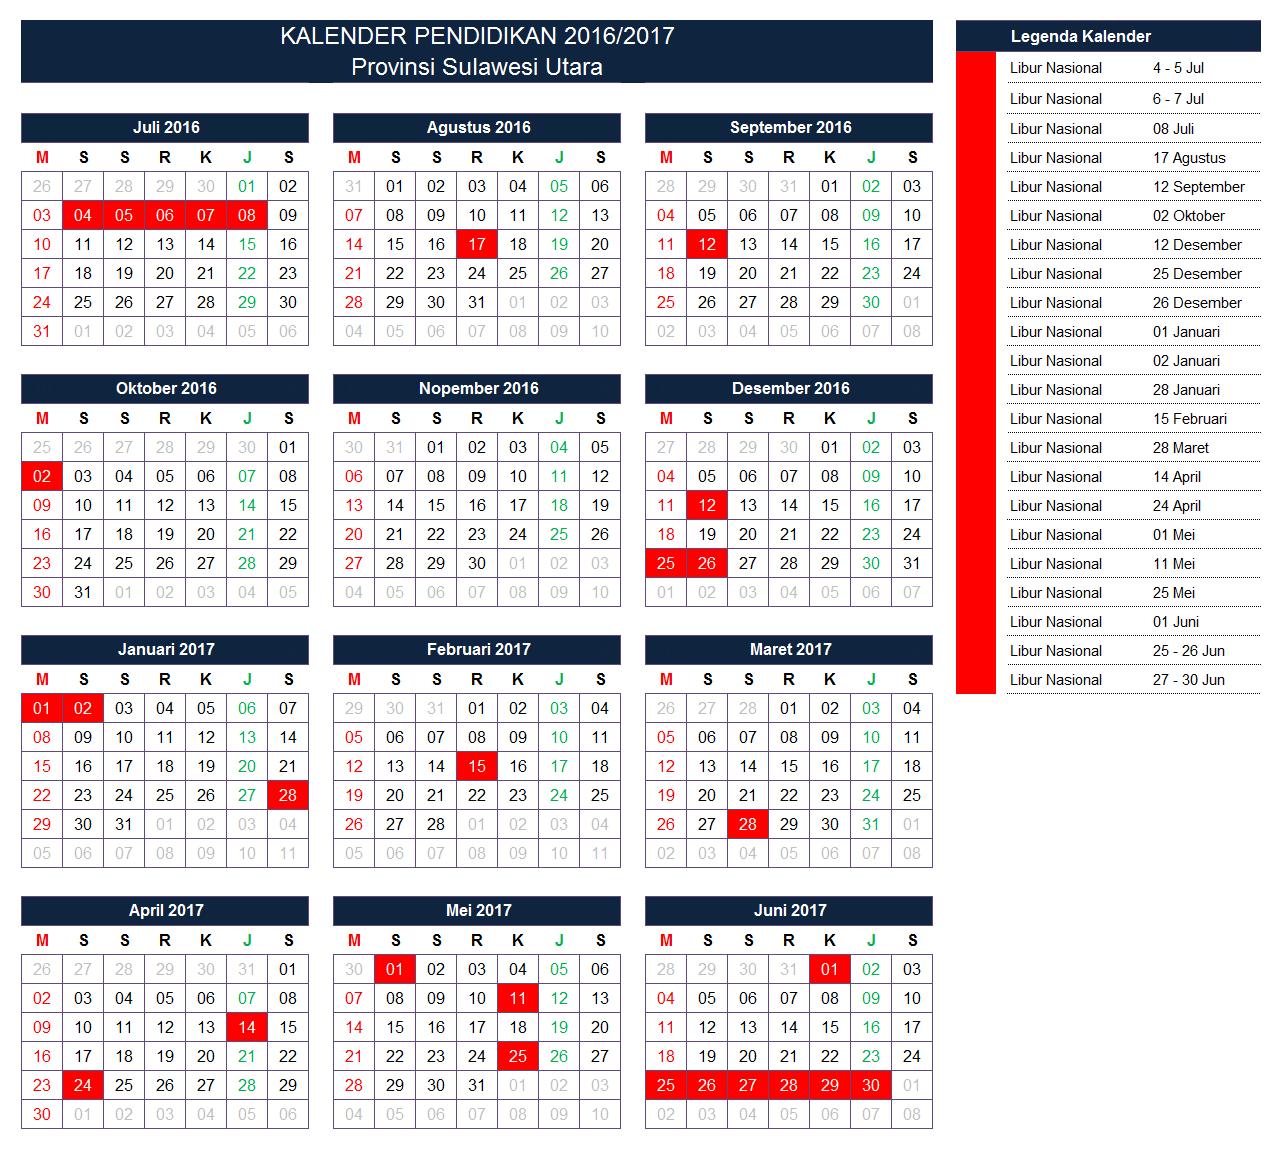 Kalender Pendidikan Provinsi Sulawesi Utara